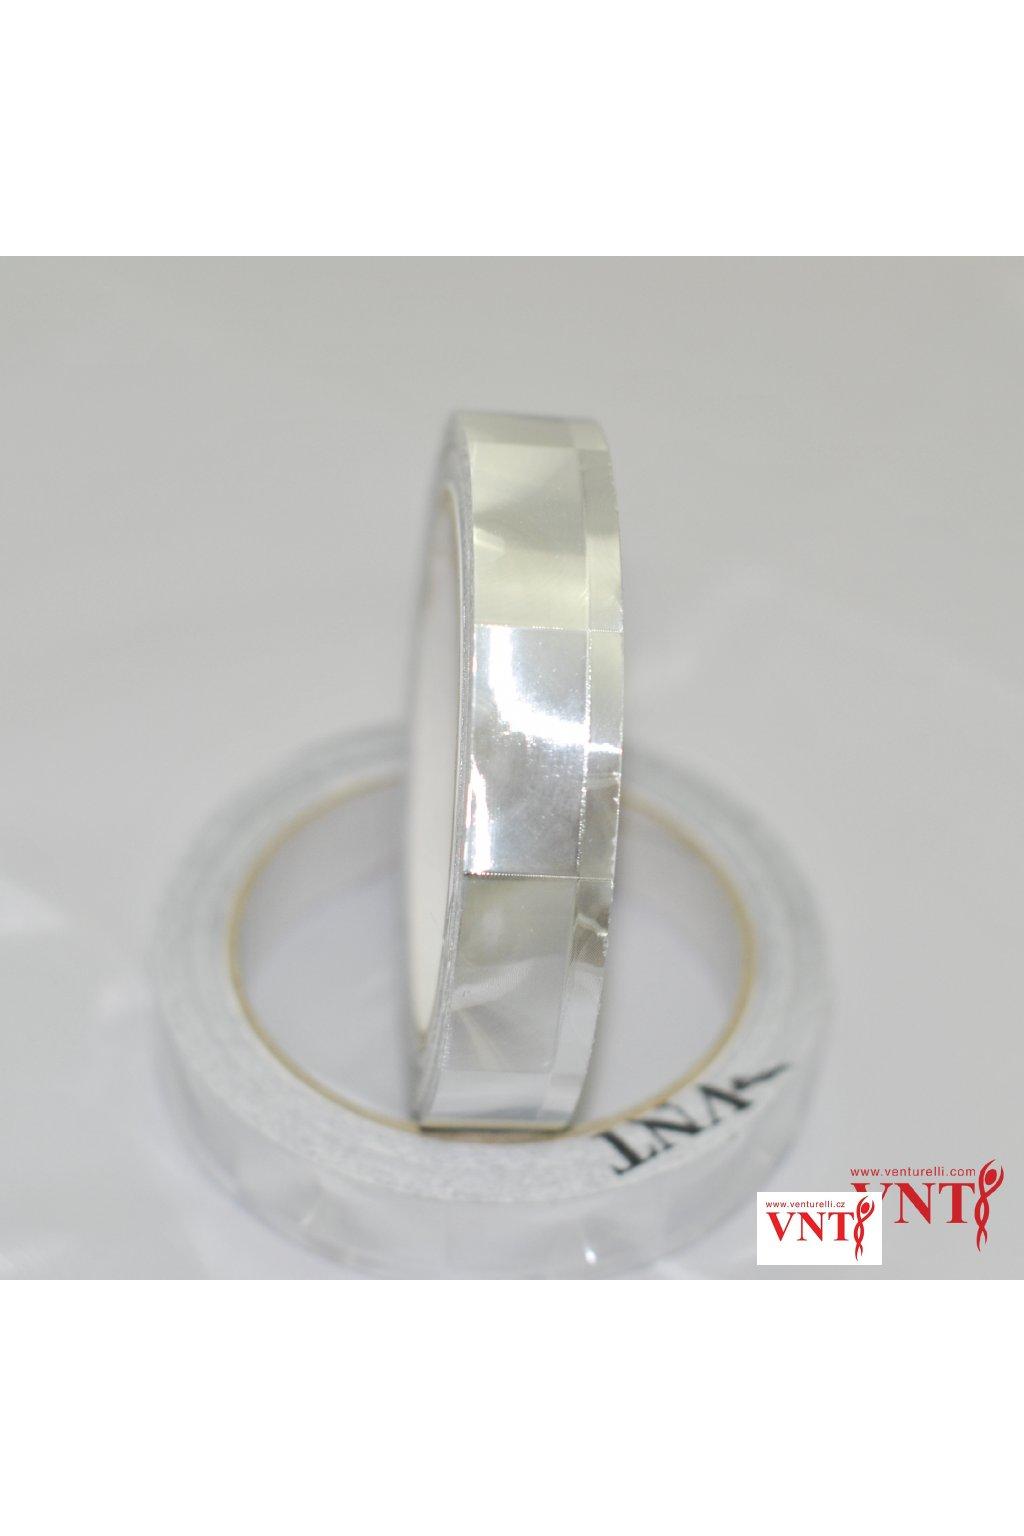 Izolepa Stříbrná optická čočka